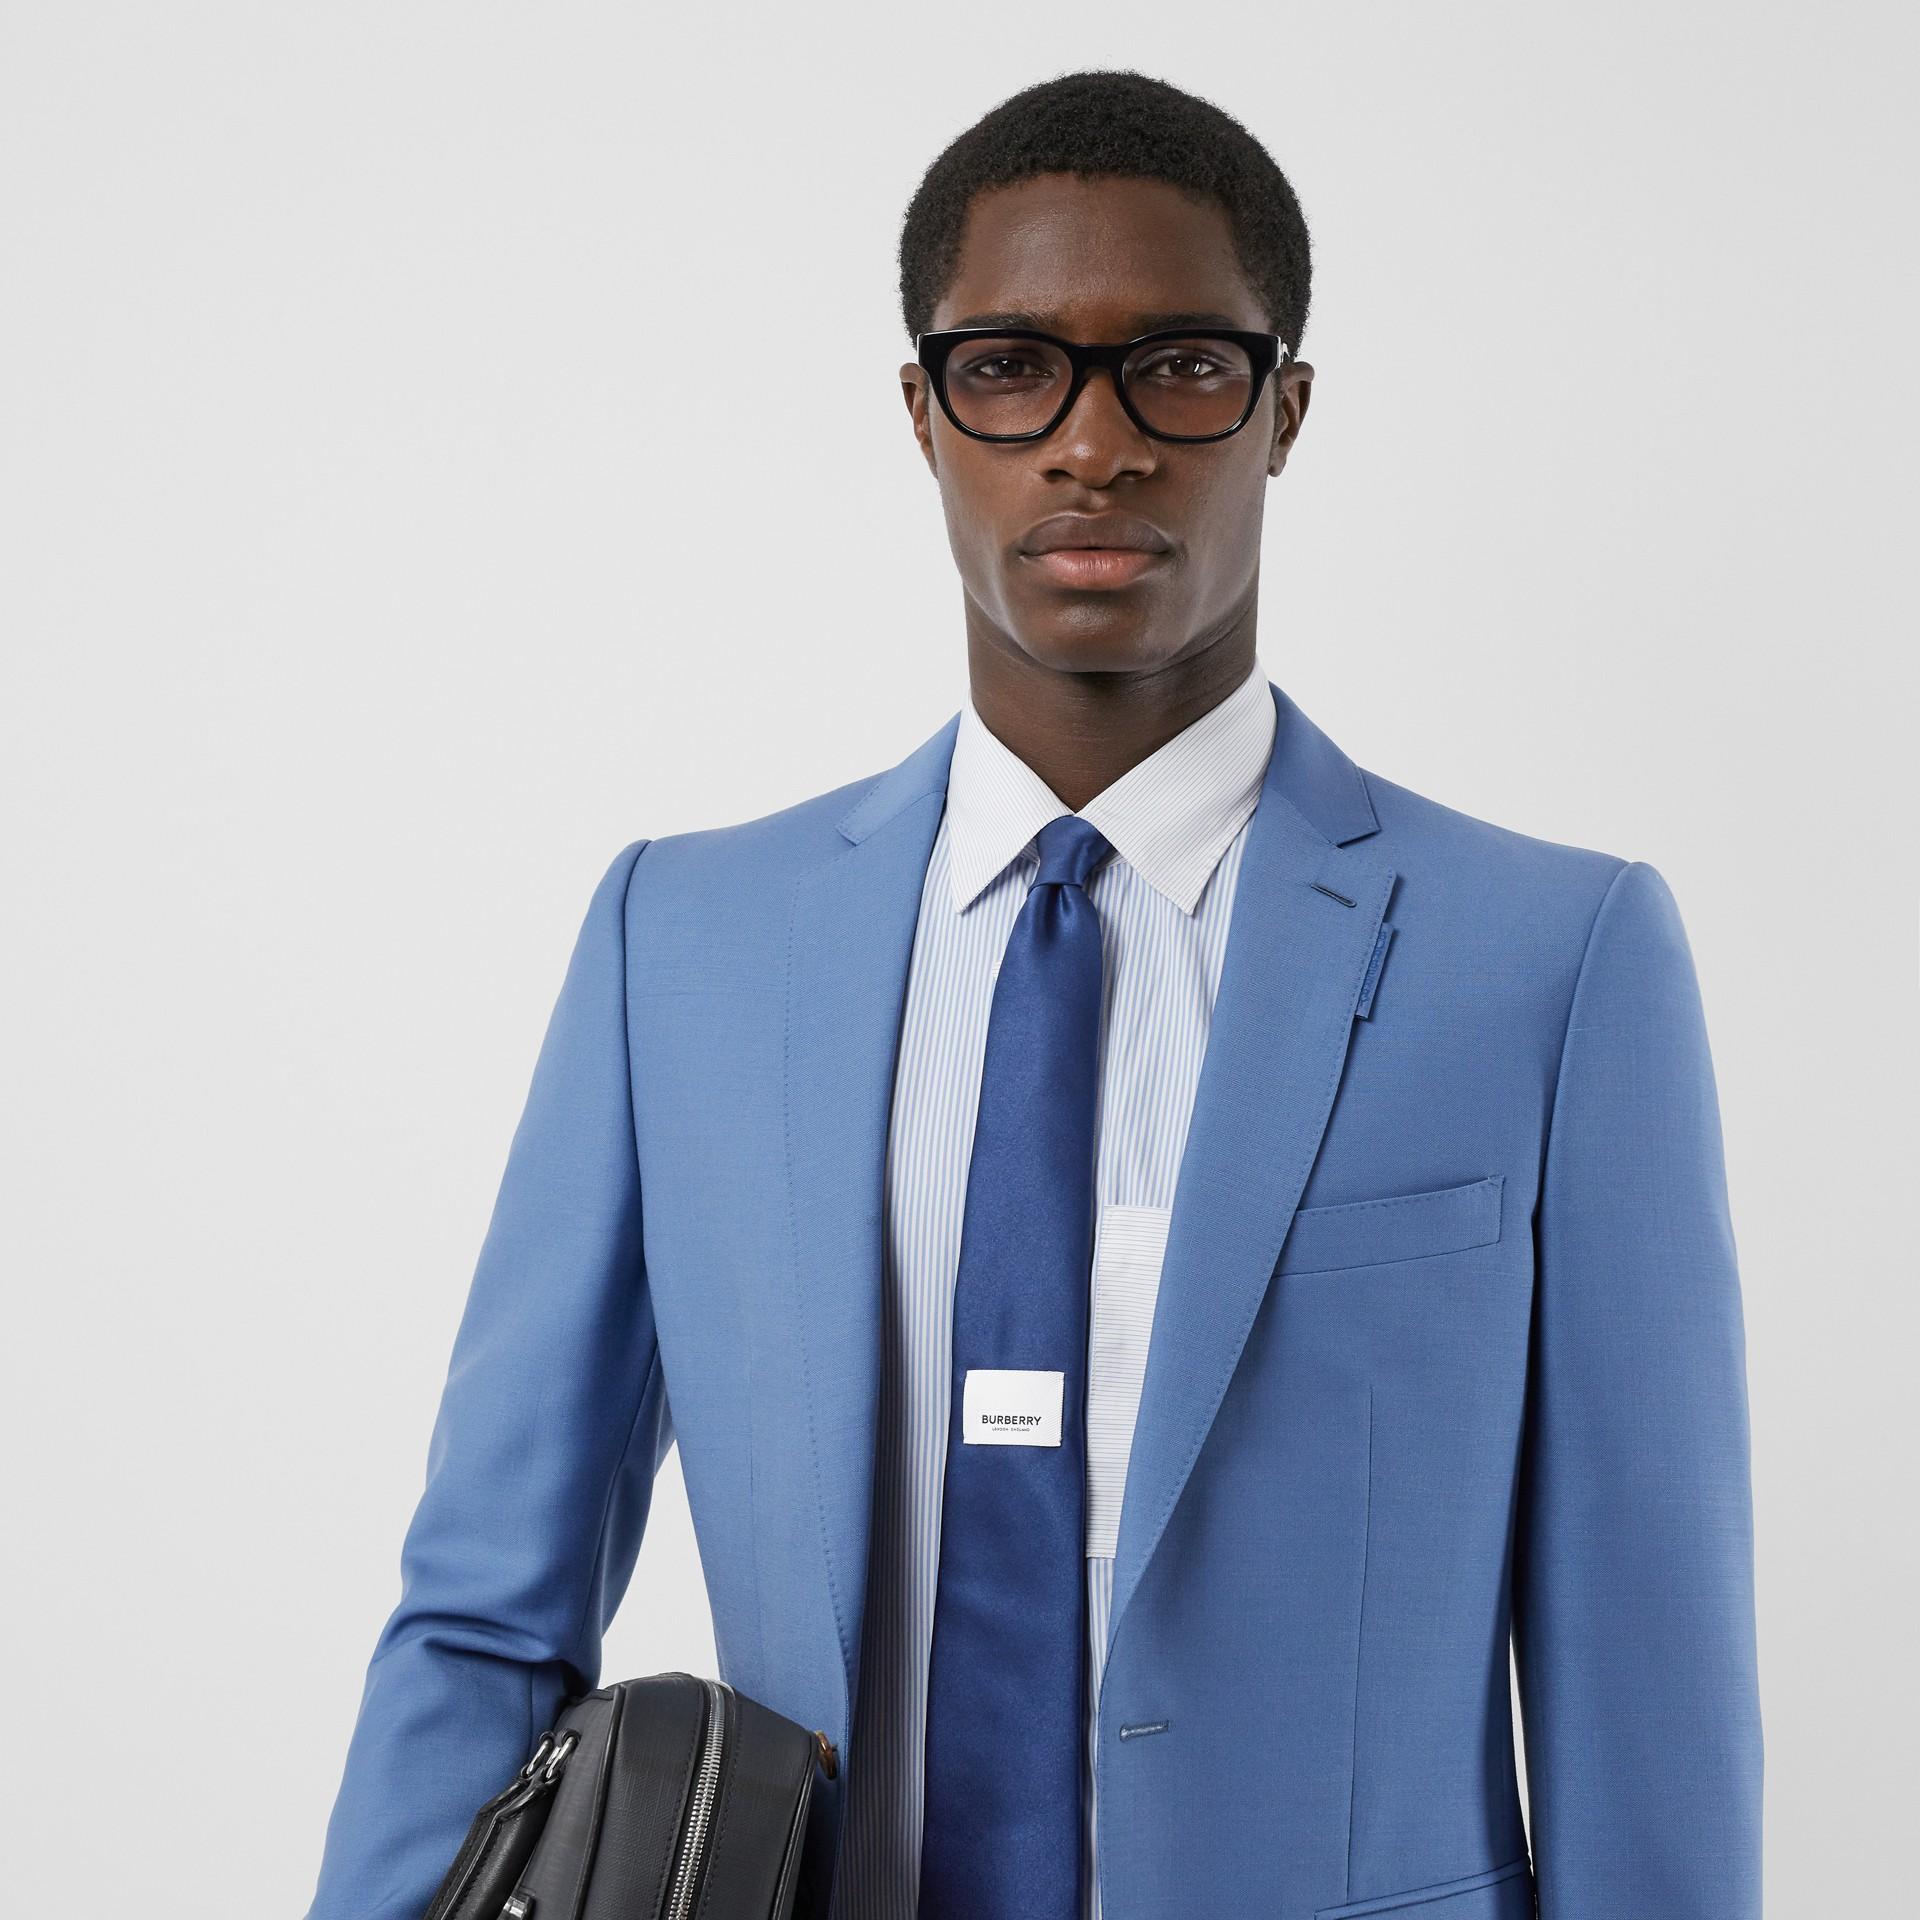 Classic Cut Logo Appliqué Silk Satin Tie in Sapphire Blue - Men | Burberry - gallery image 2